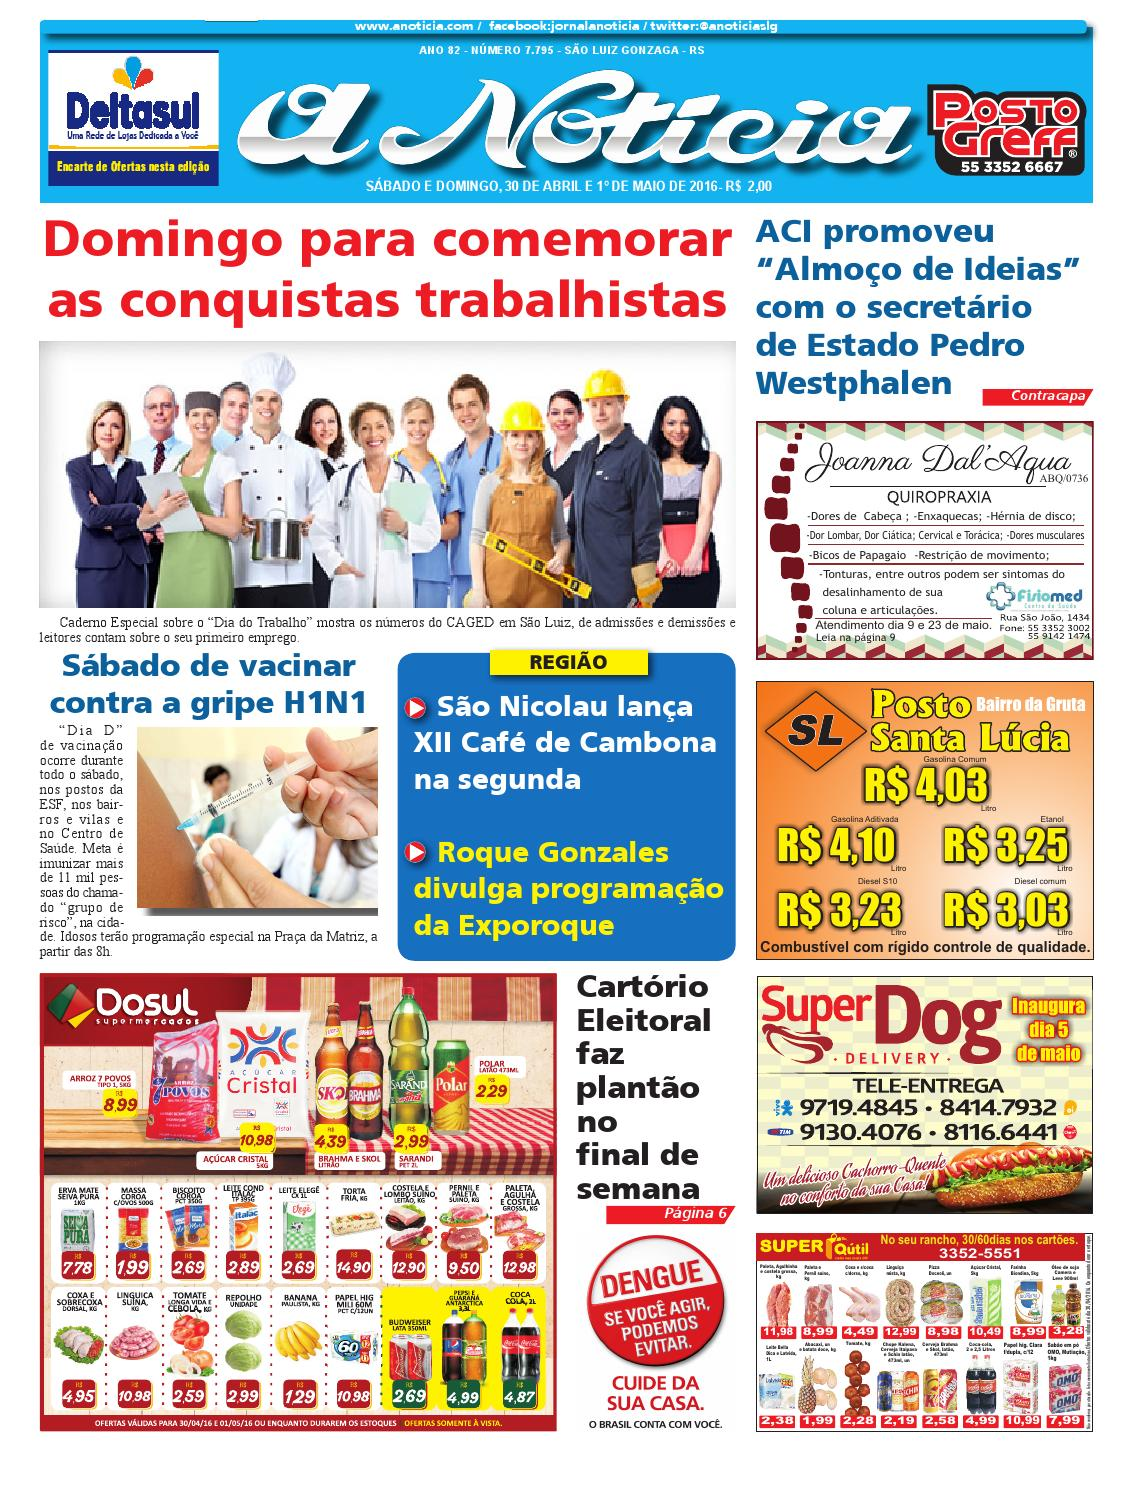 d72b37d01 Edição de 30 de abril e 1º de maio de 2016 by Luiz Fernando Natividade  Rocha - issuu